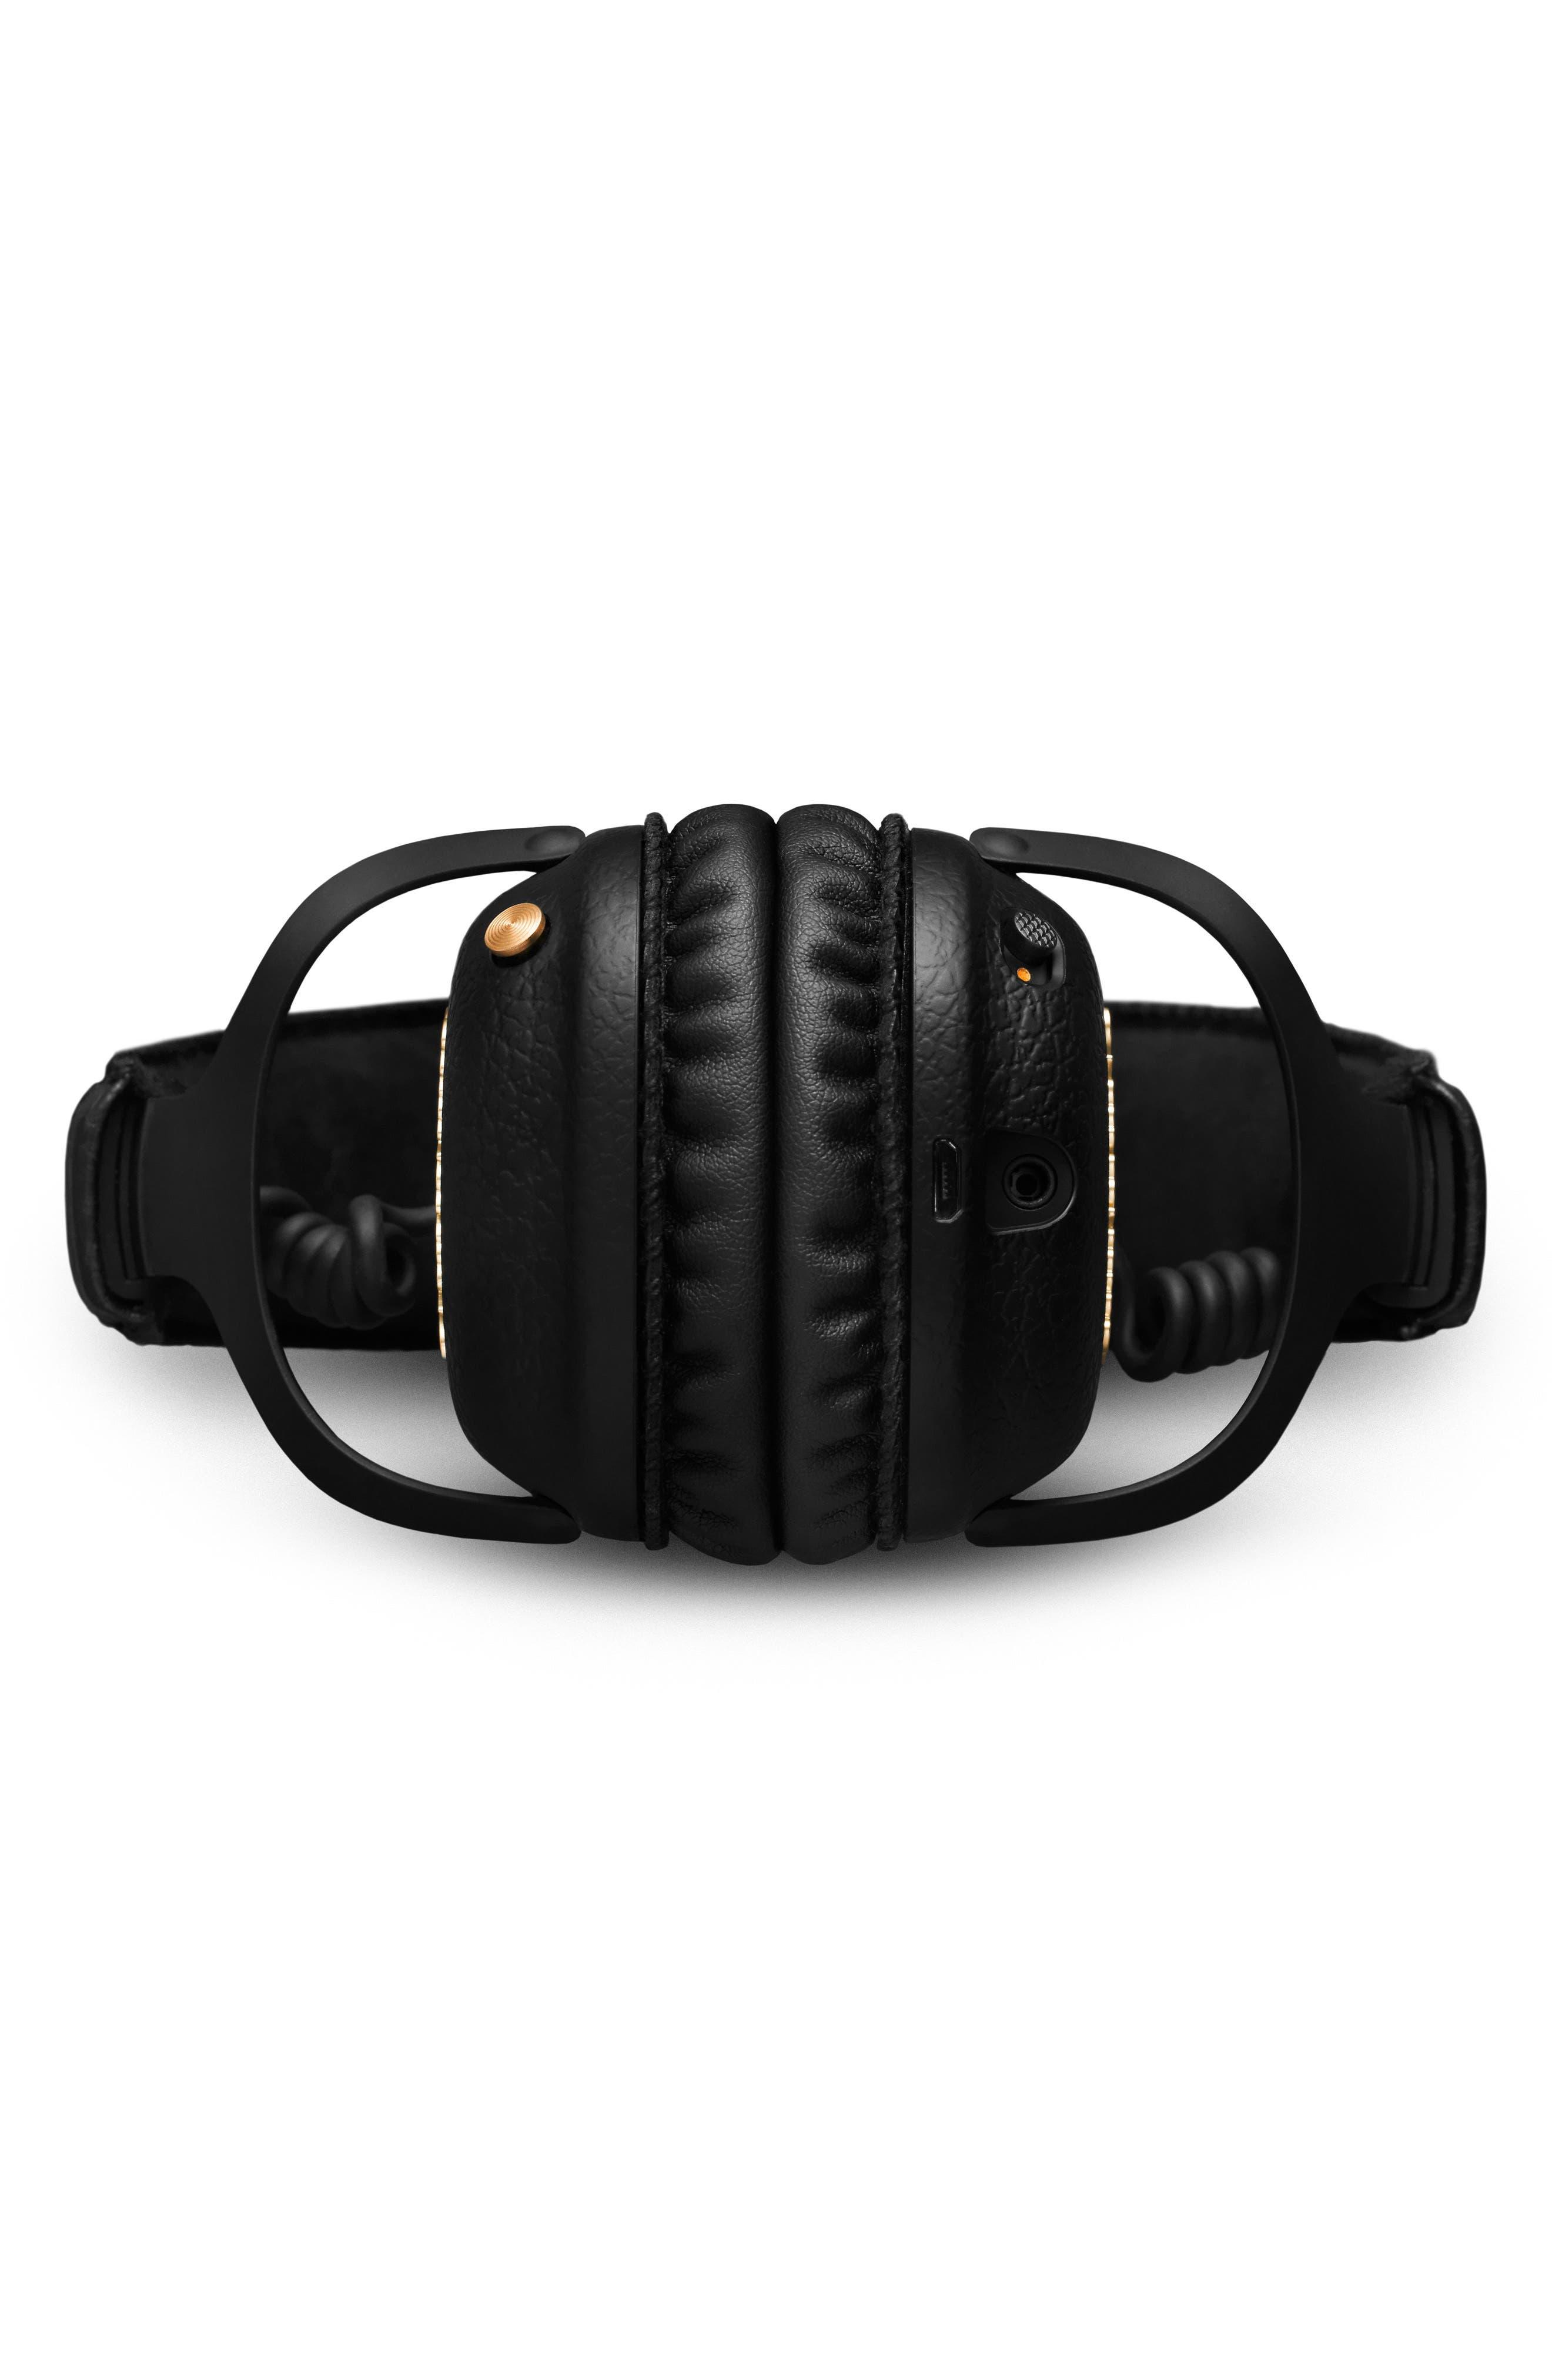 MID ANC Bluetooth<sup>®</sup> On-Ear Headphones,                             Alternate thumbnail 5, color,                             BLACK